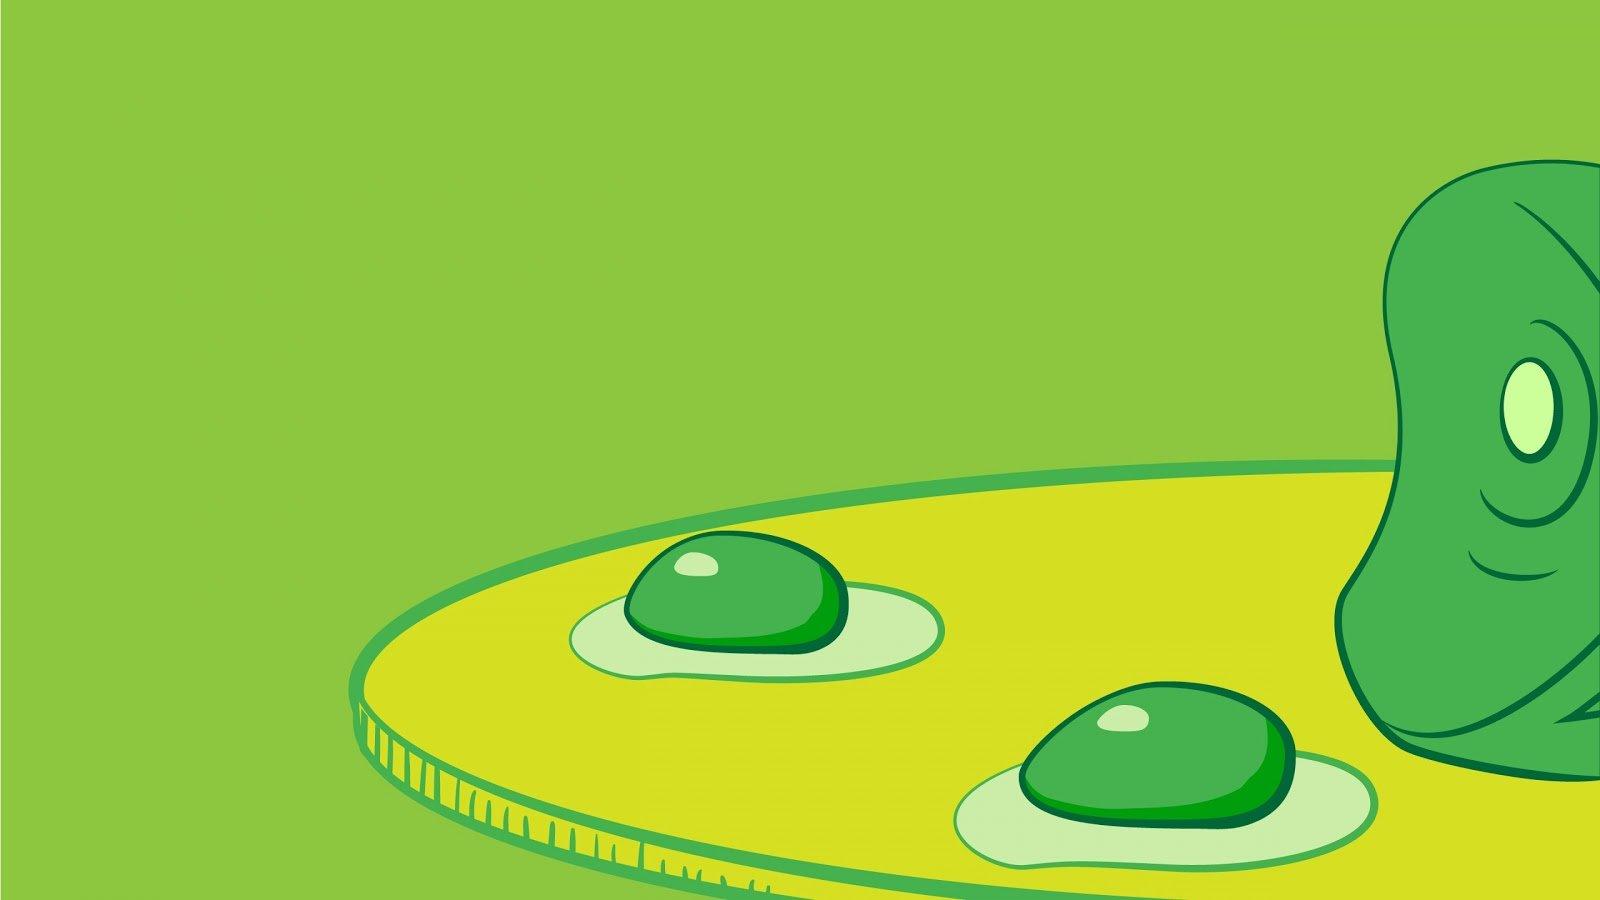 food_minimalist_design_background_69257_3840x2160